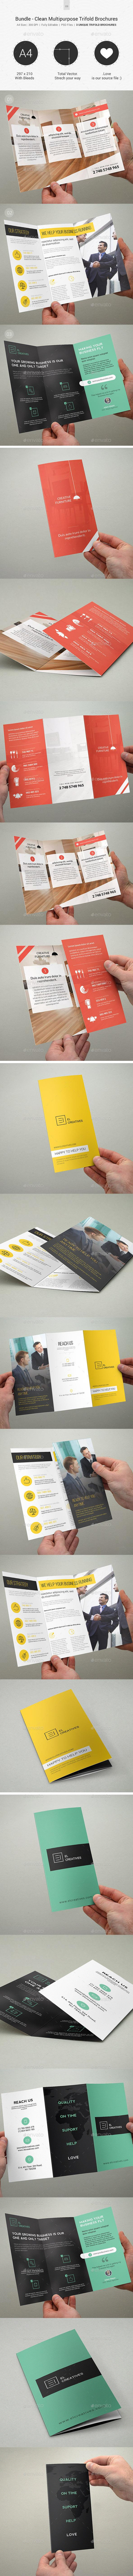 Bundle - Creative Trifold Brochures - 09 - Corporate Brochures